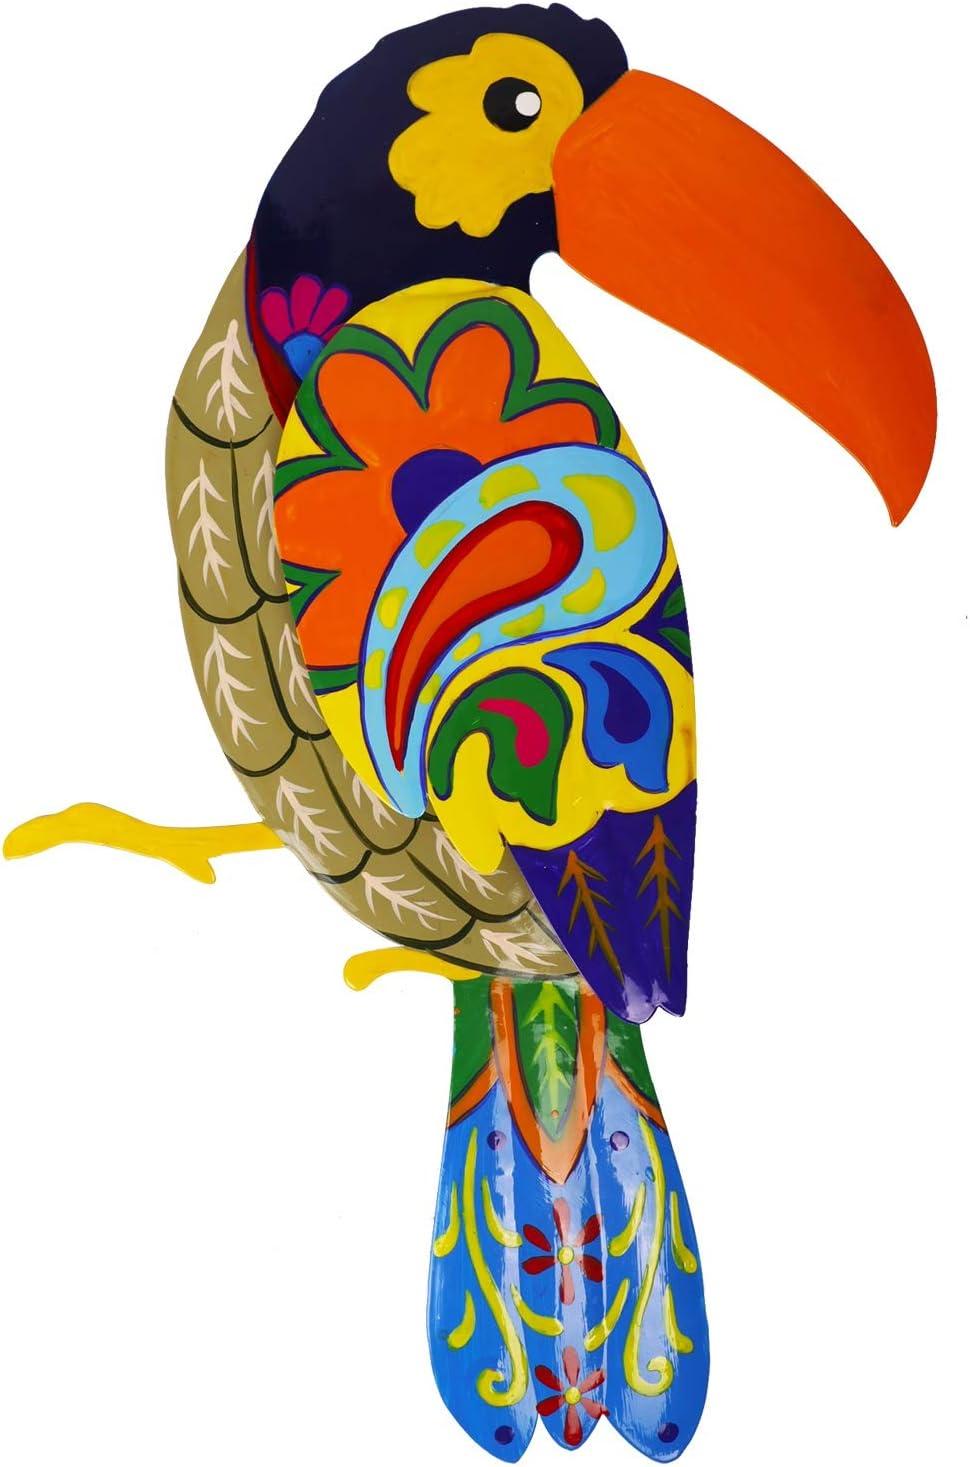 Adroiteet Large Metal Hornbill Wall Decor, Vivid Colorful Bird Art Wall Hanging for Indoor Outdoor Home Bedroom Office Garden